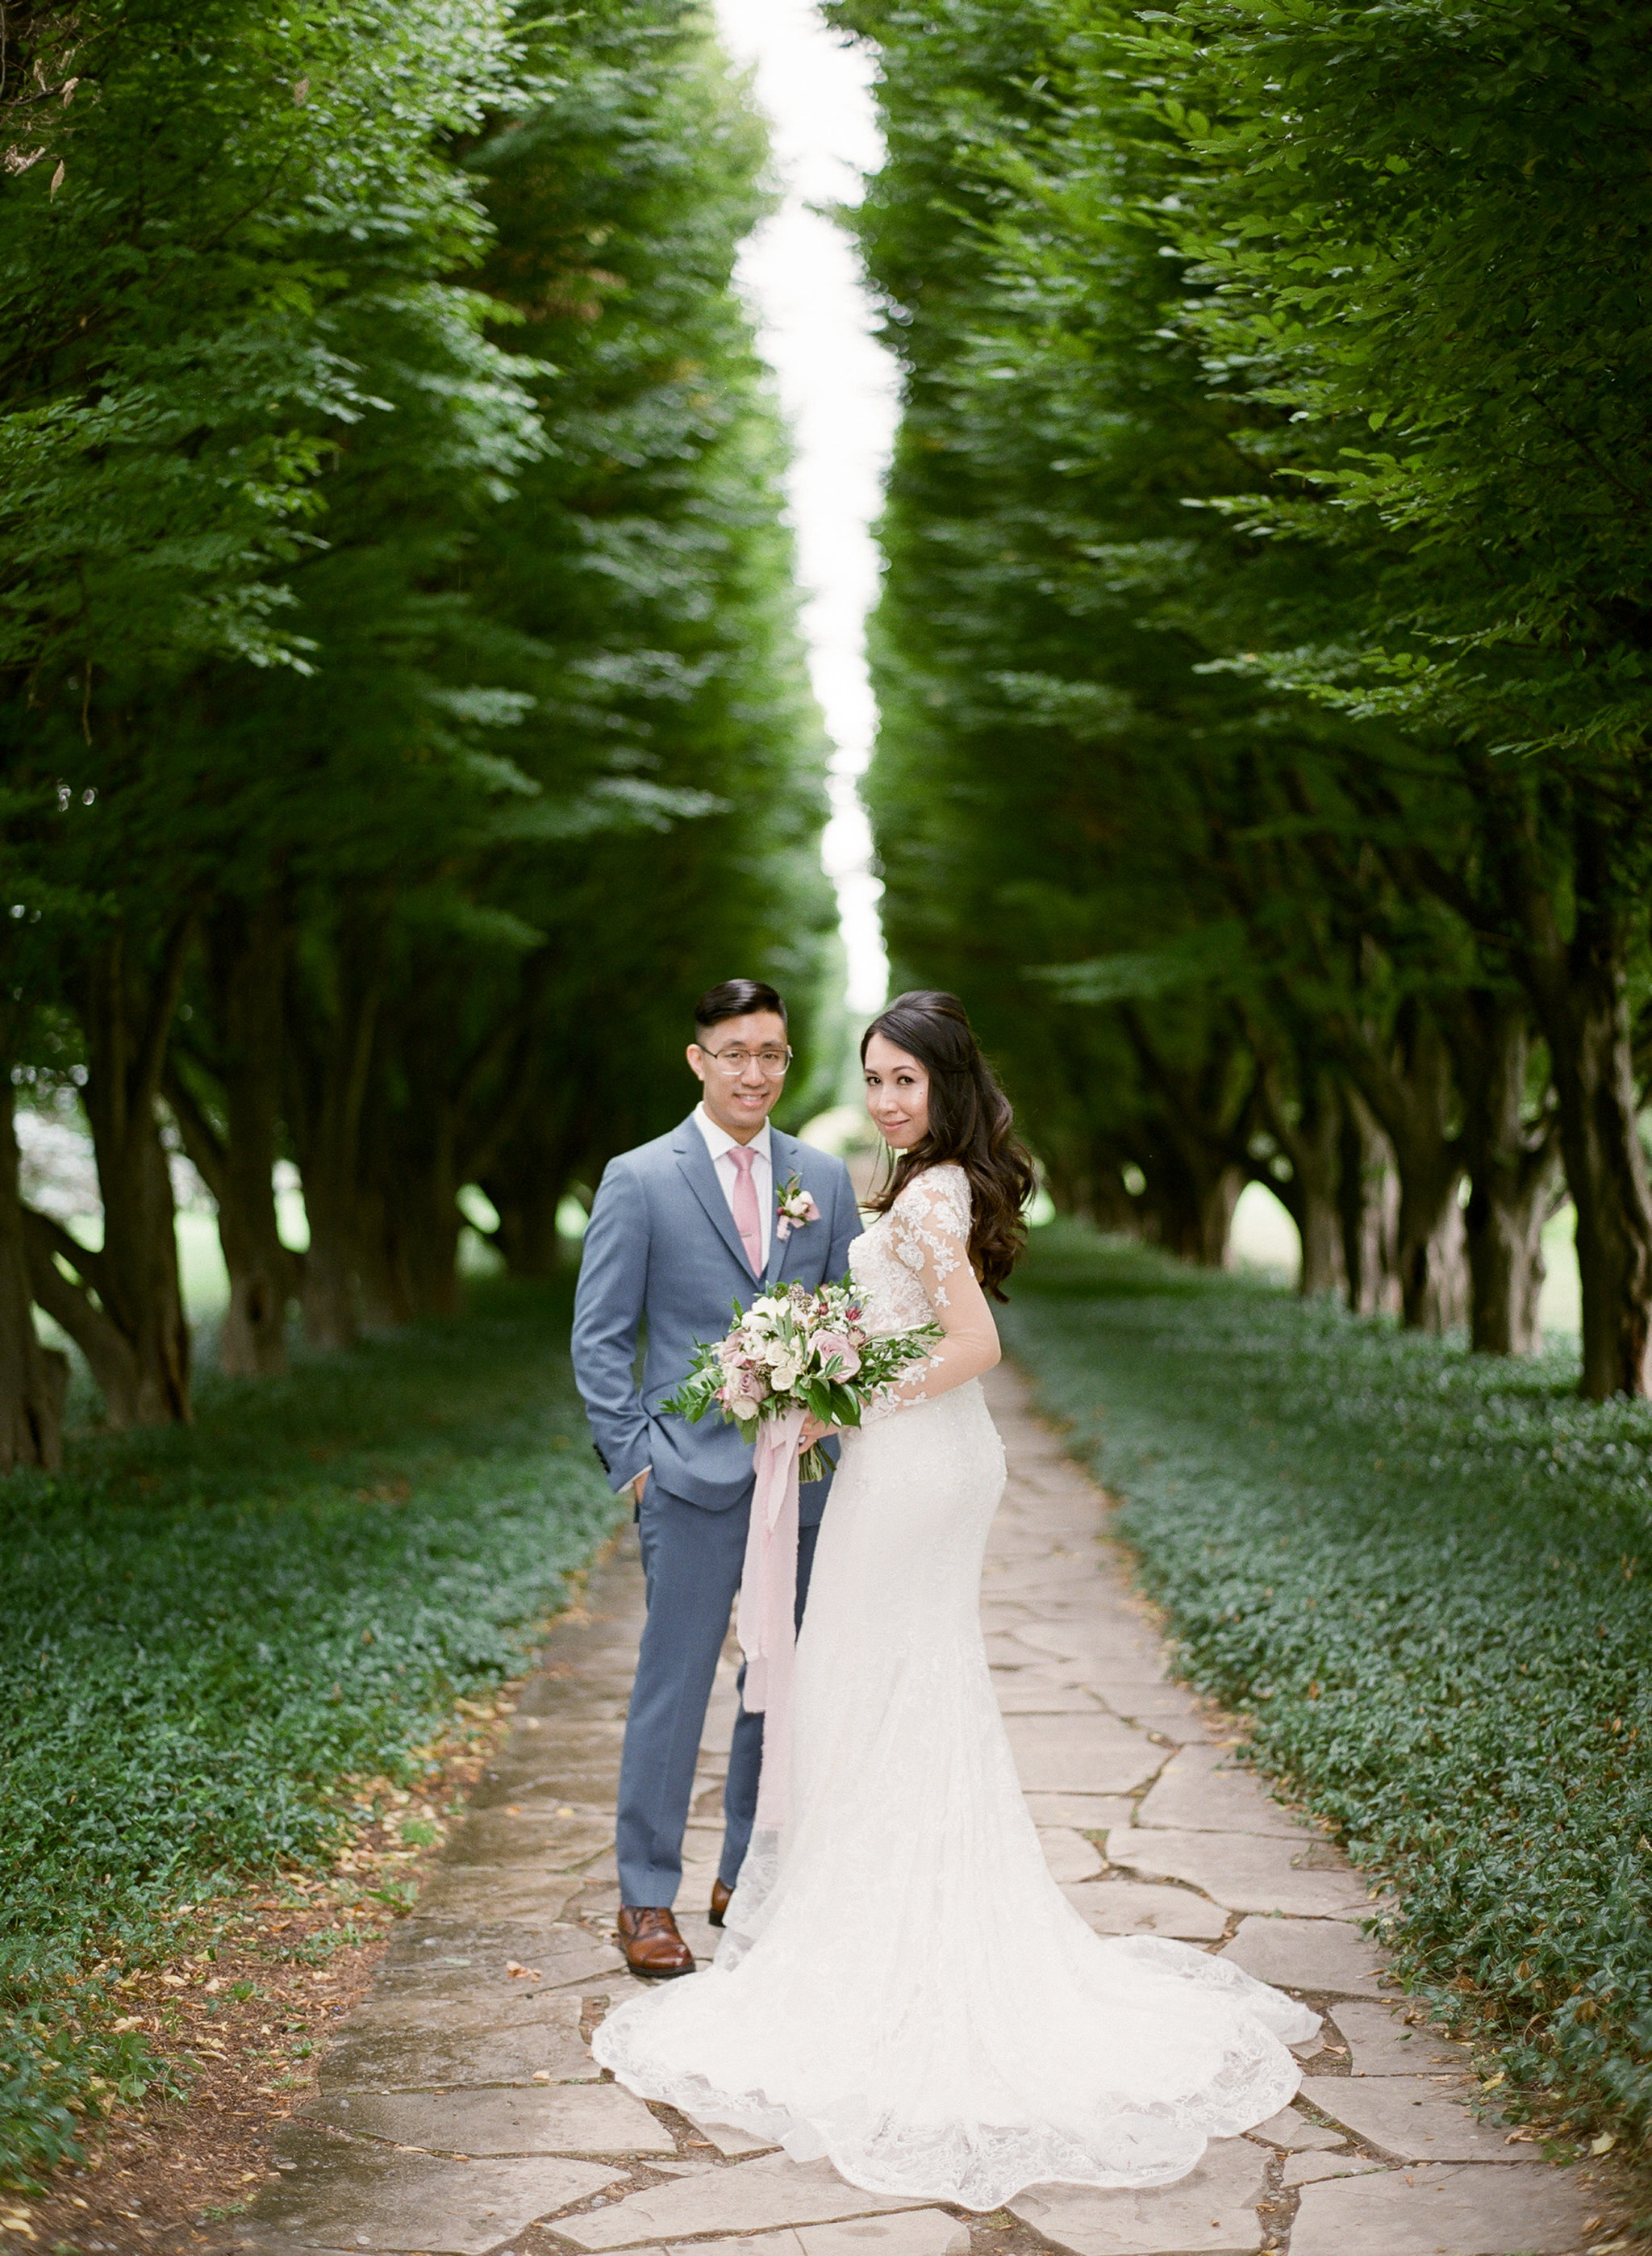 0389-artiese-chateau-des-charmes-wedding-sonia-tim-000095270001.jpg